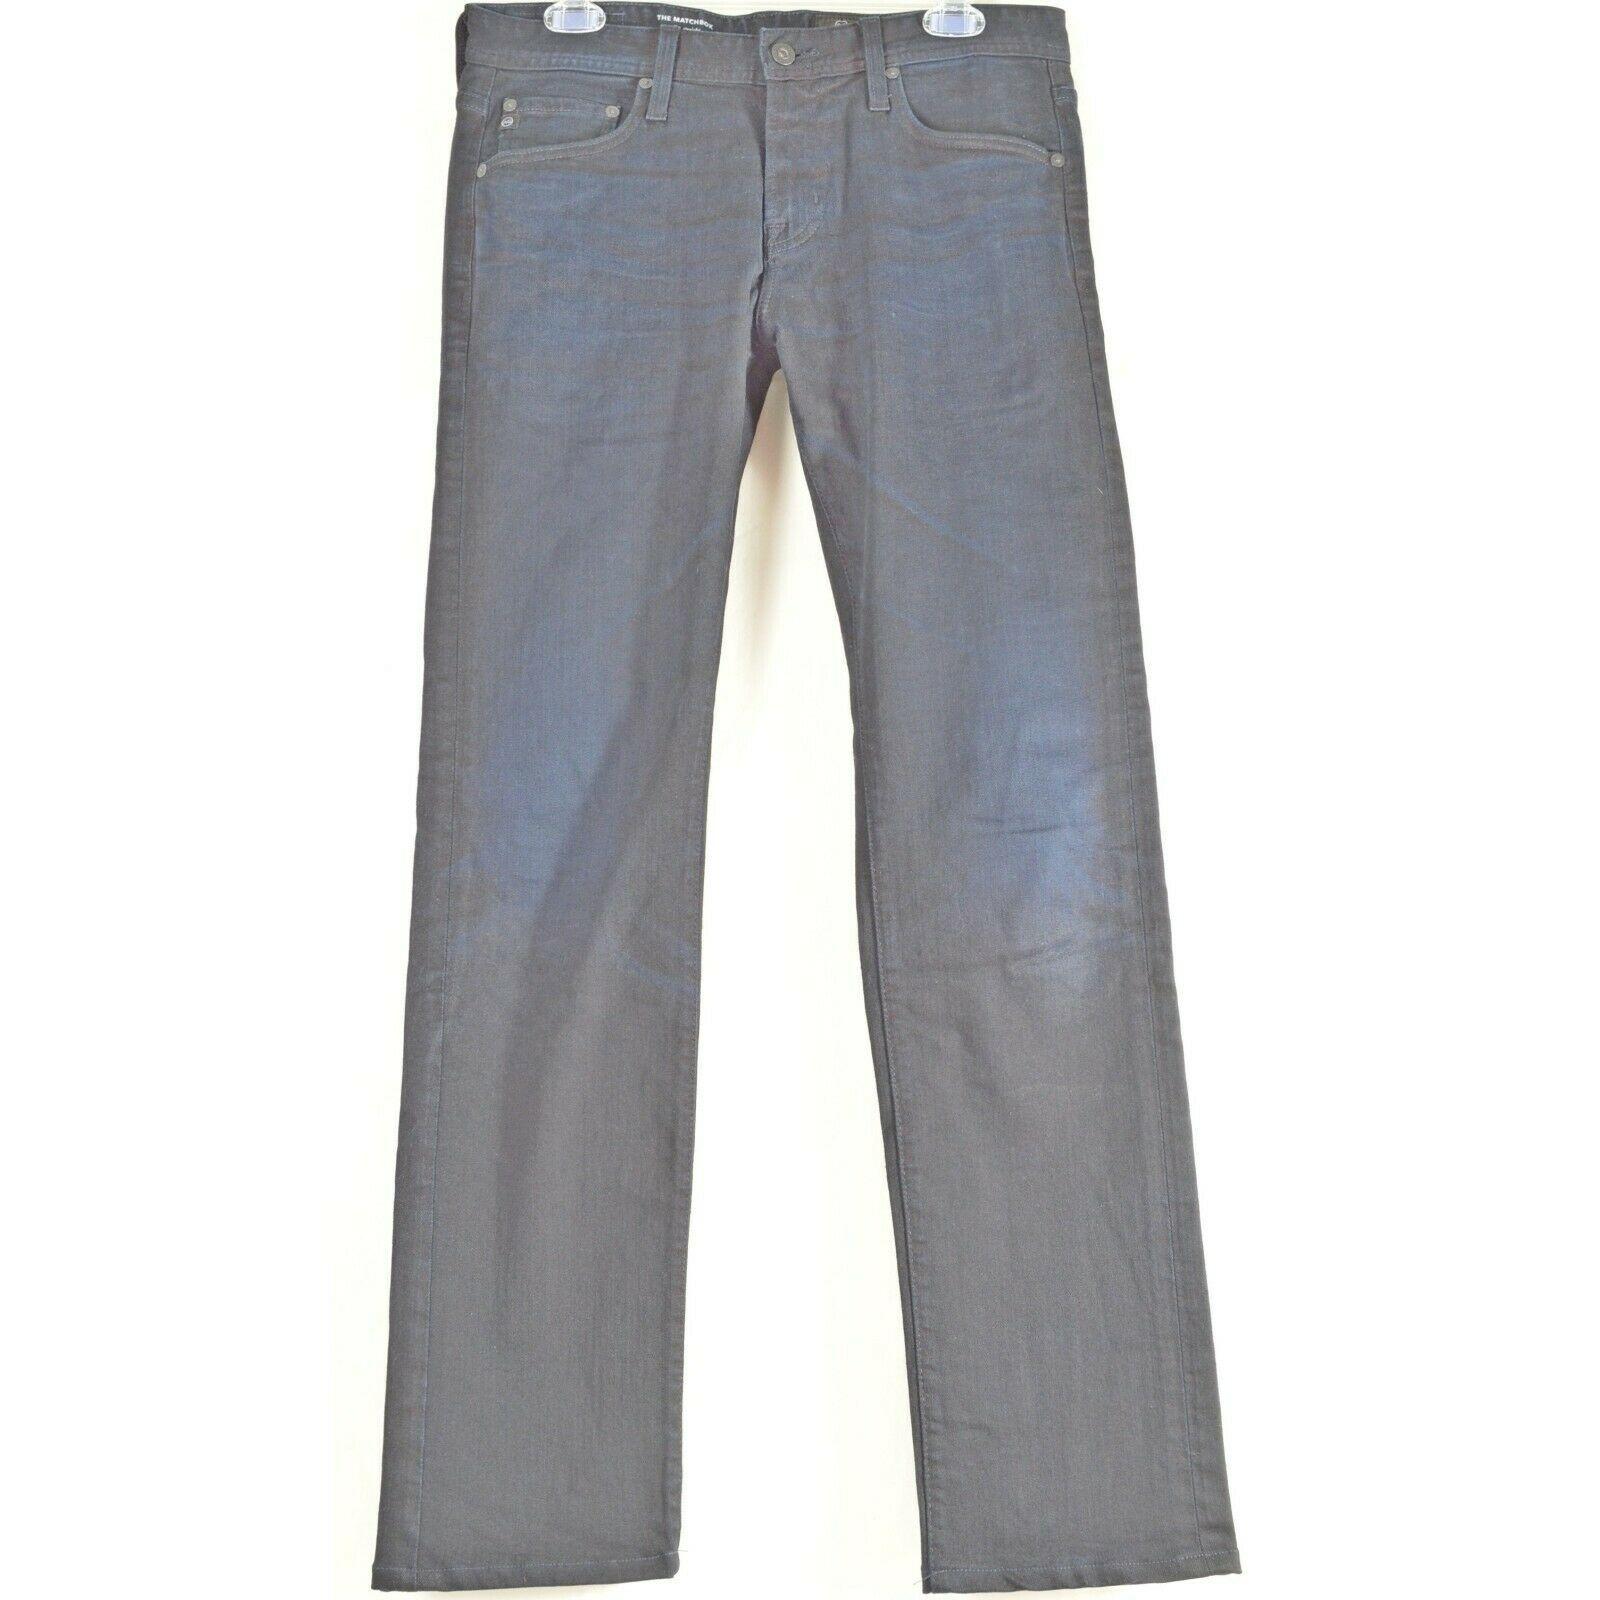 AG Adriano Goldschmied jeans 30 x 34 men Matchbox dark Slim Straight tall unique image 8